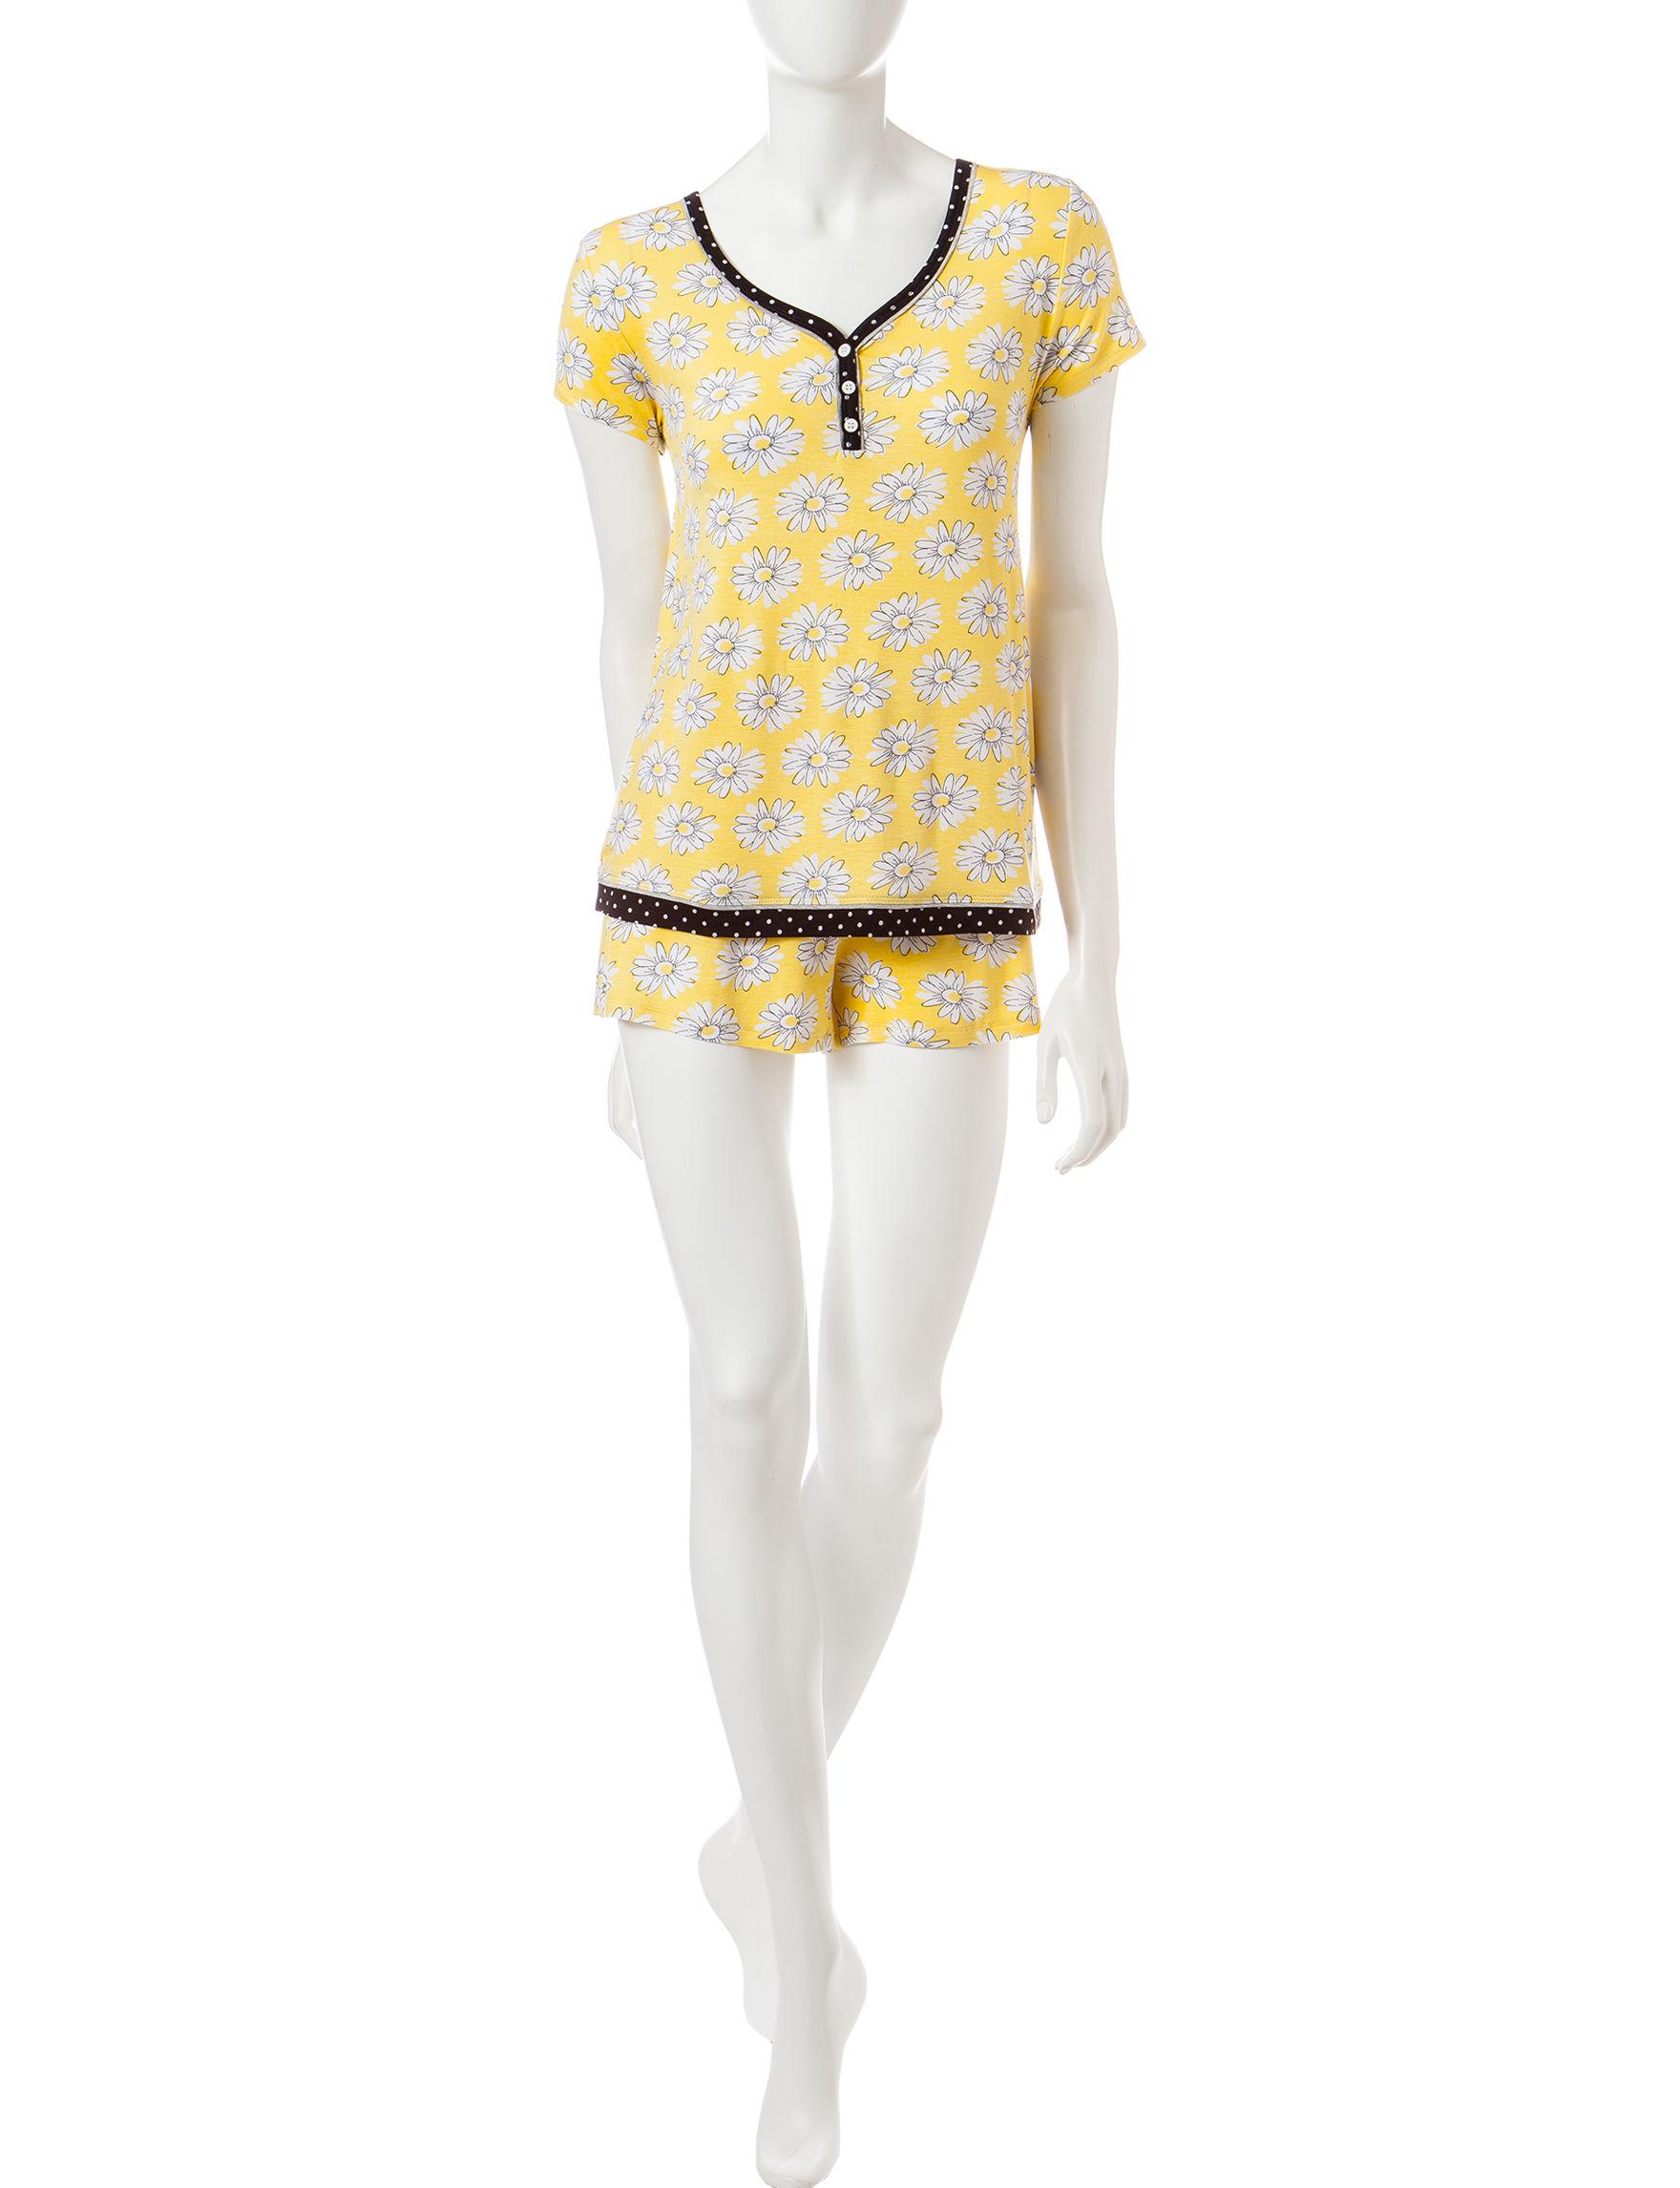 Rene Rofe Pink Multi Pajama Sets